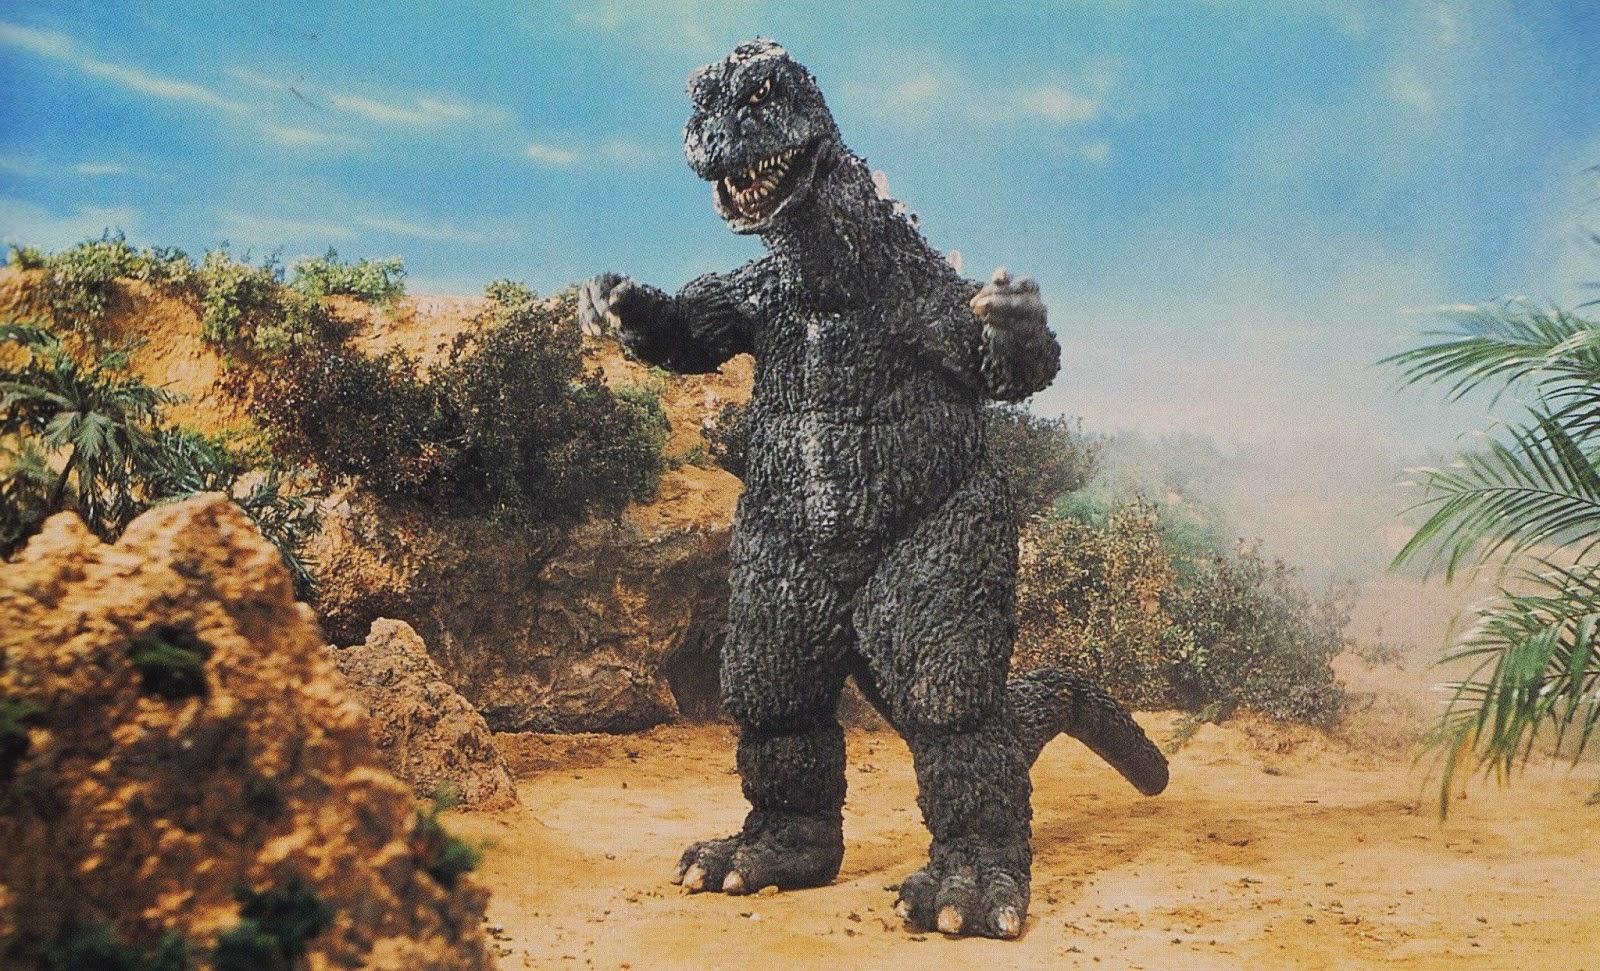 Godzilla Monster